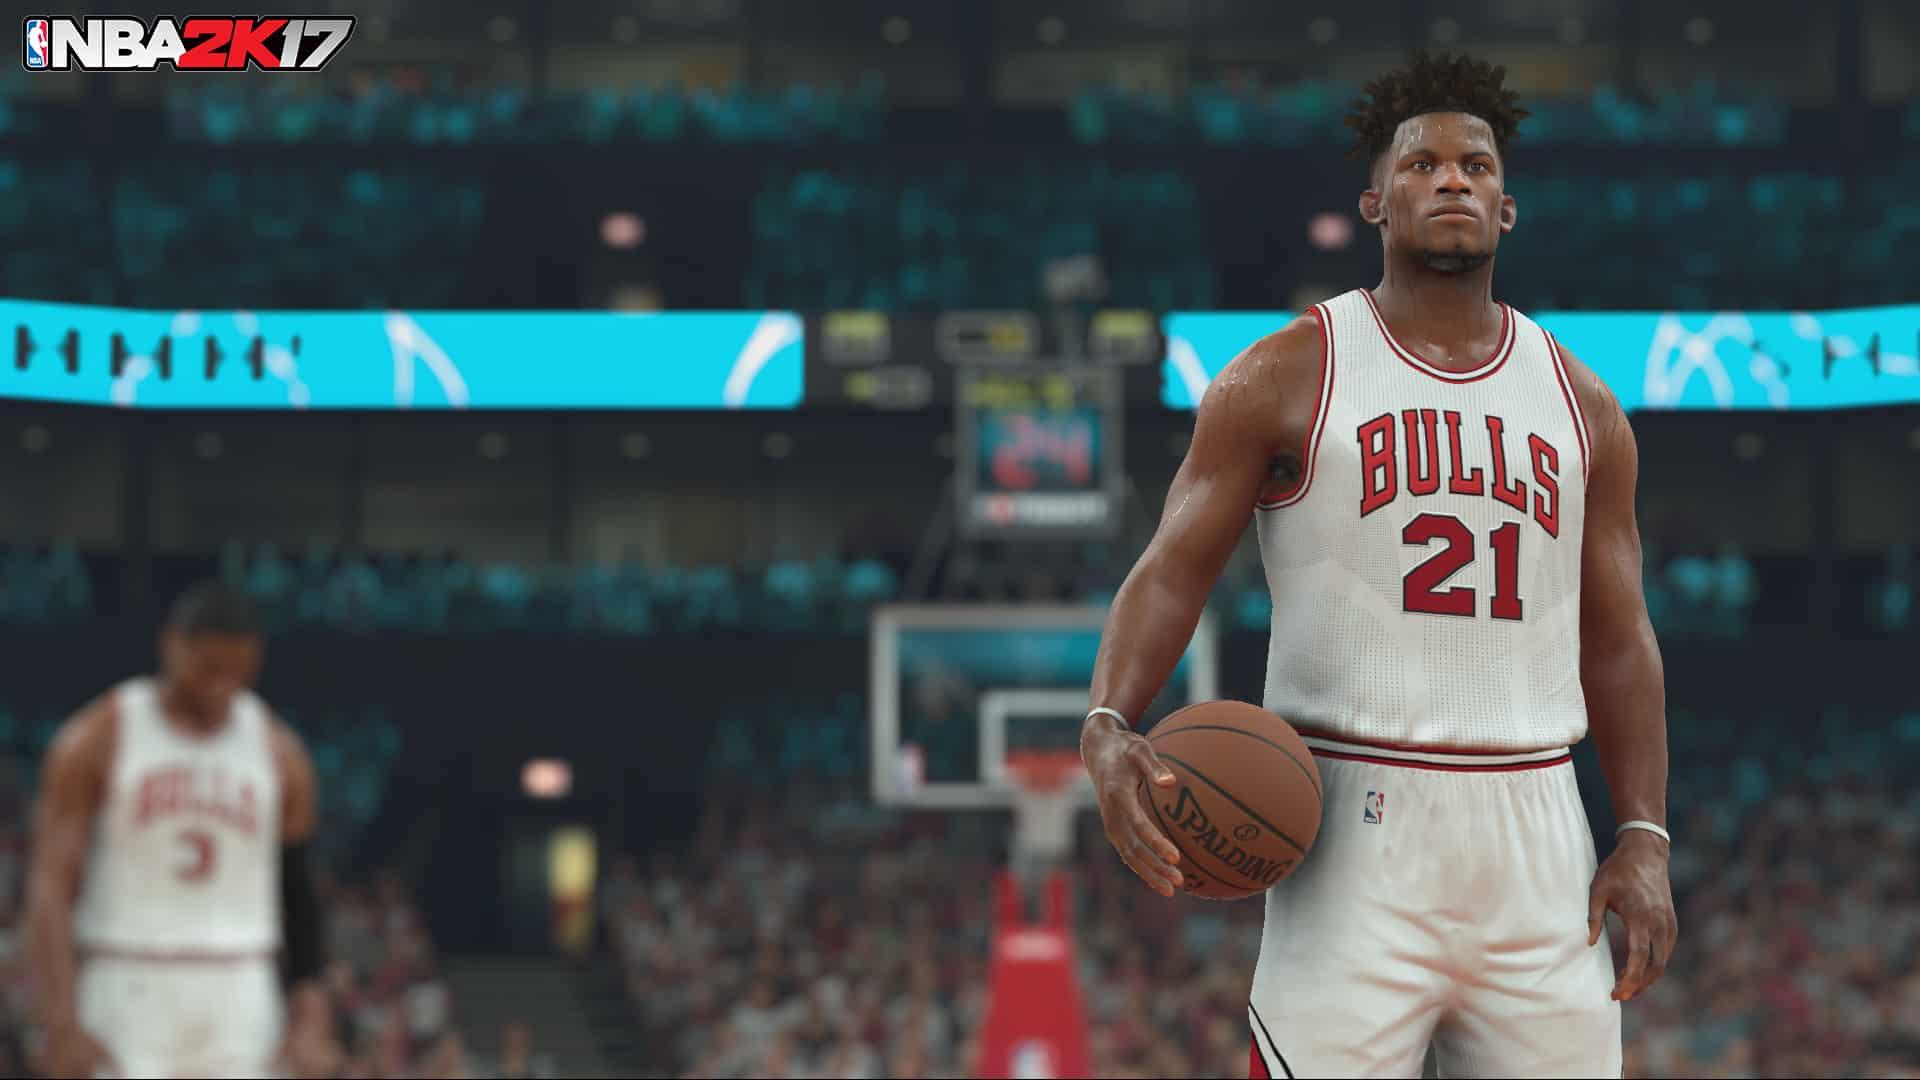 NBA 2K17 Scarica di pc gratis